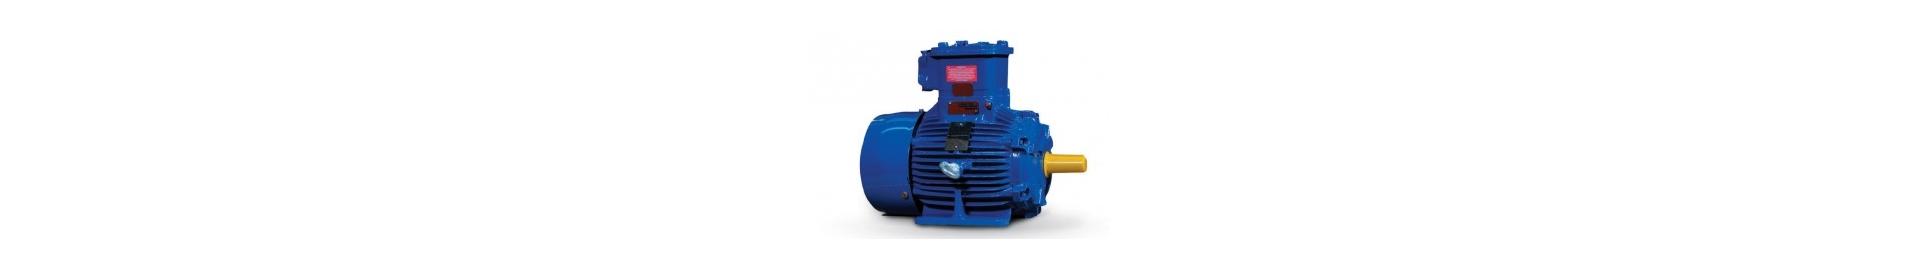 Silniki ognioszczelne EXD/DE